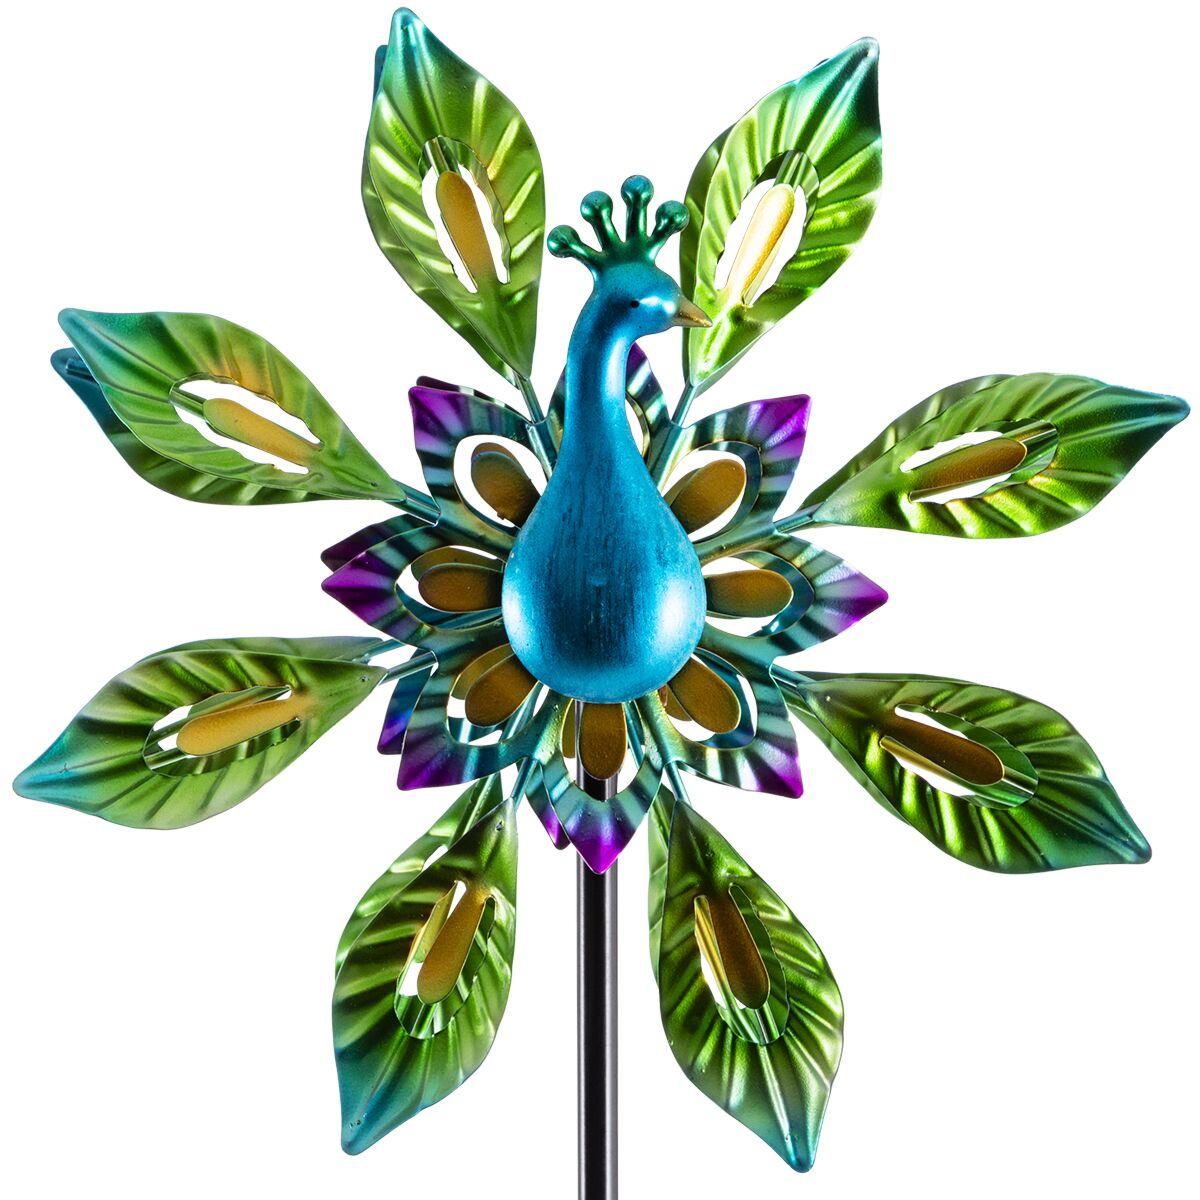 Smart Garden peacock wind spinner £7.99 at Robert Dyas free c&c